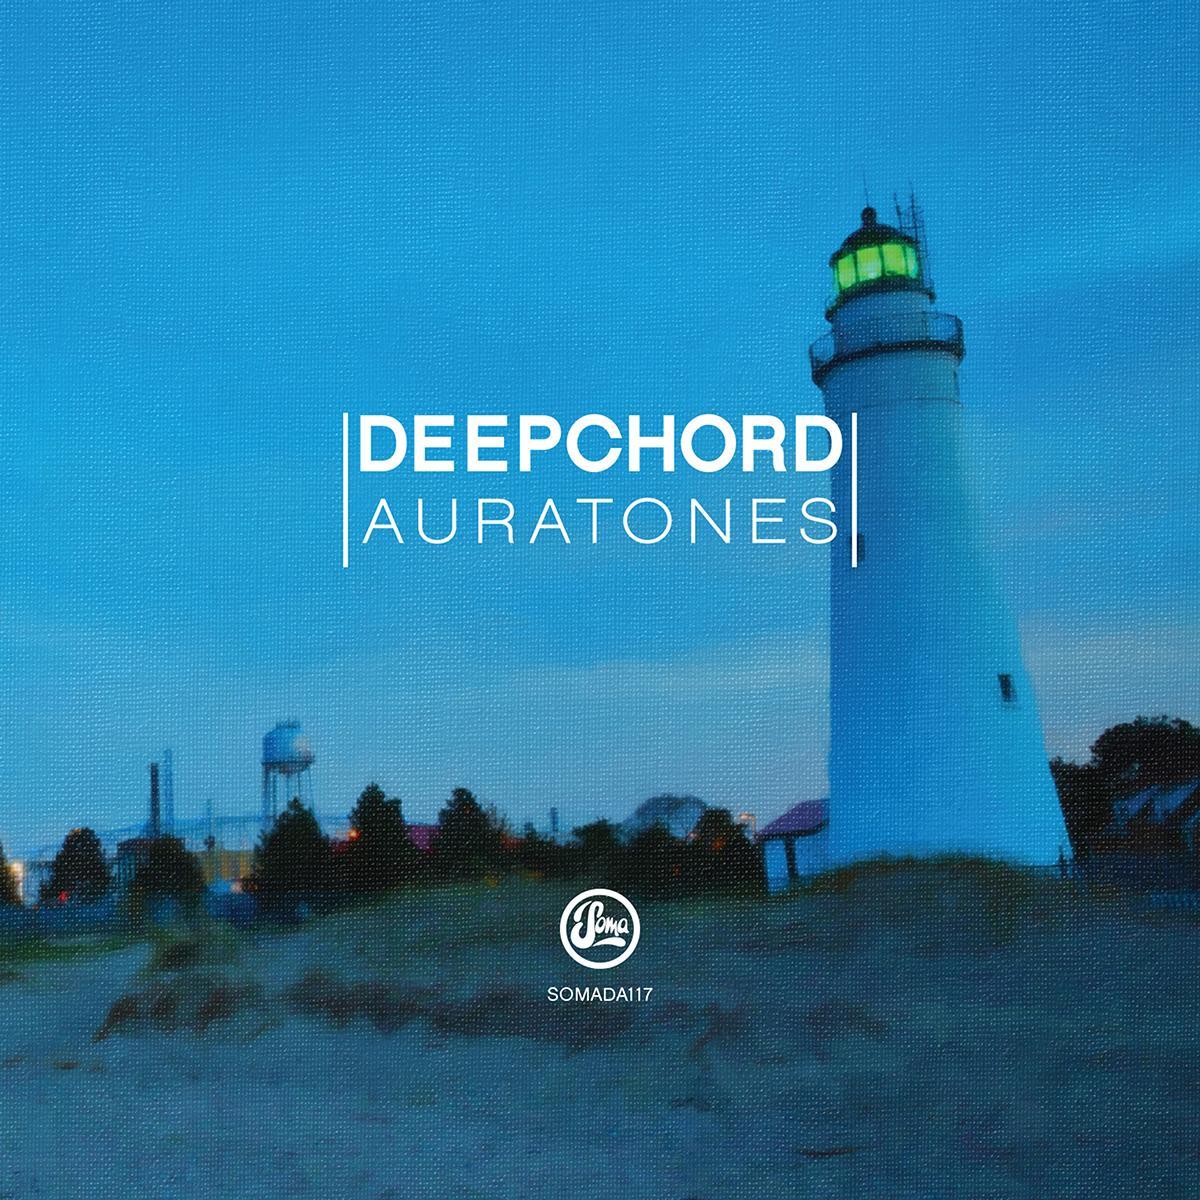 Deepchord/AURATONES DLP